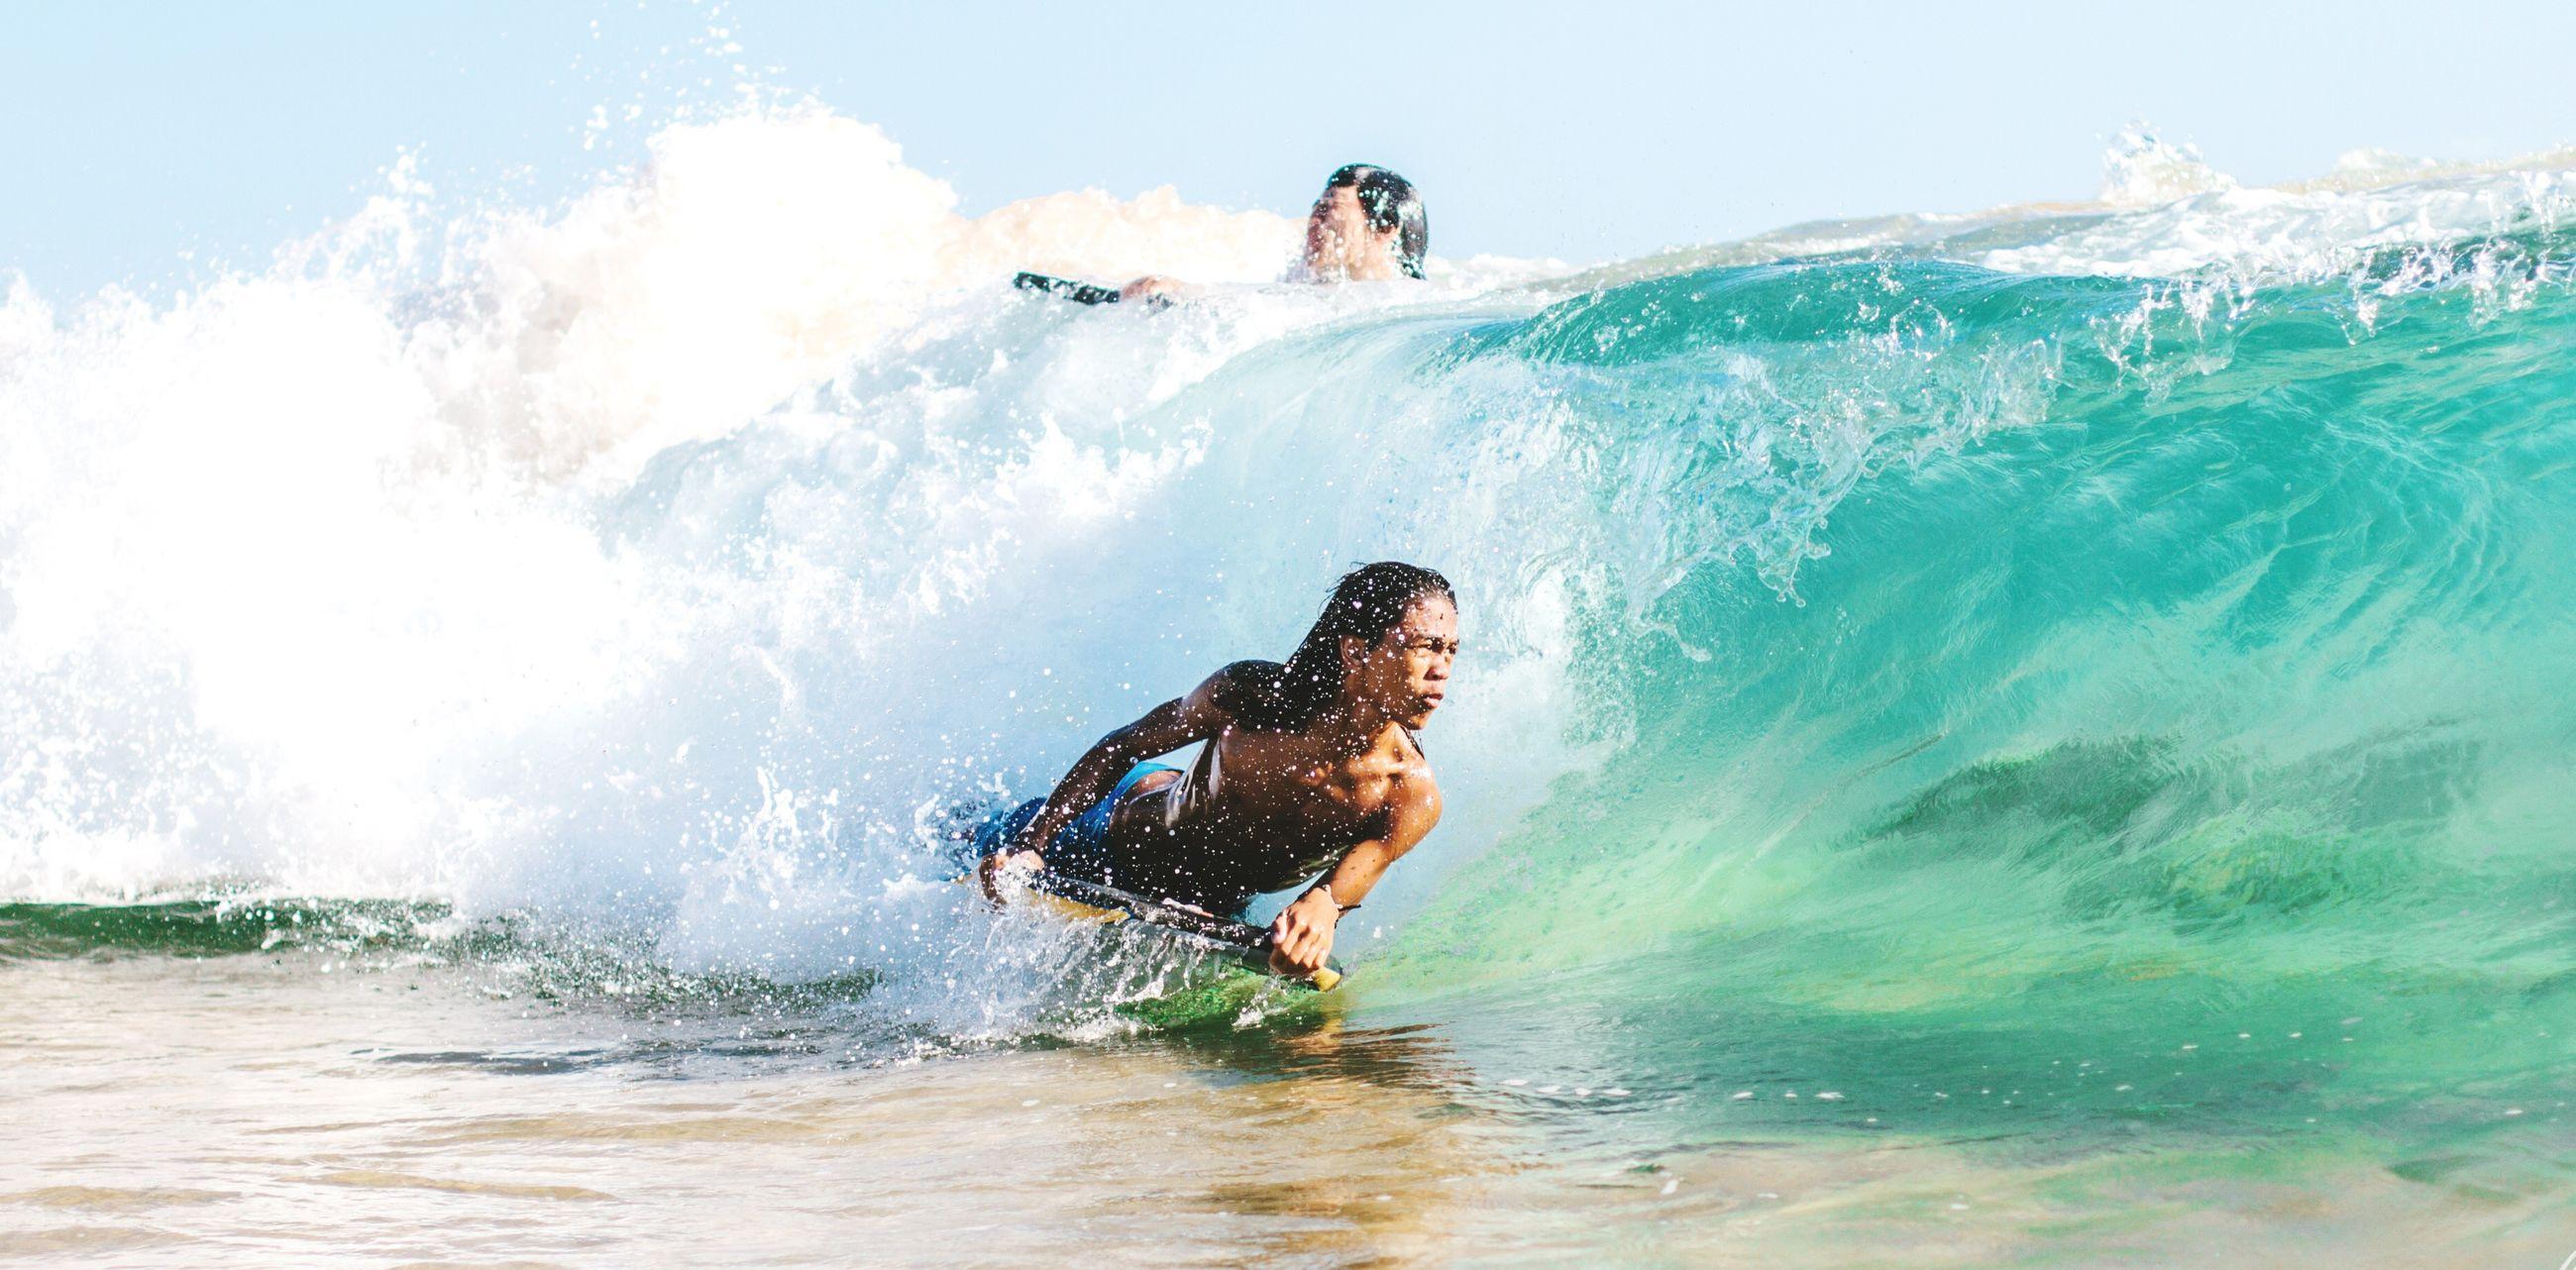 water, leisure activity, lifestyles, sea, men, enjoyment, motion, vacations, waterfront, fun, splashing, sport, wave, full length, extreme sports, adventure, skill, sky